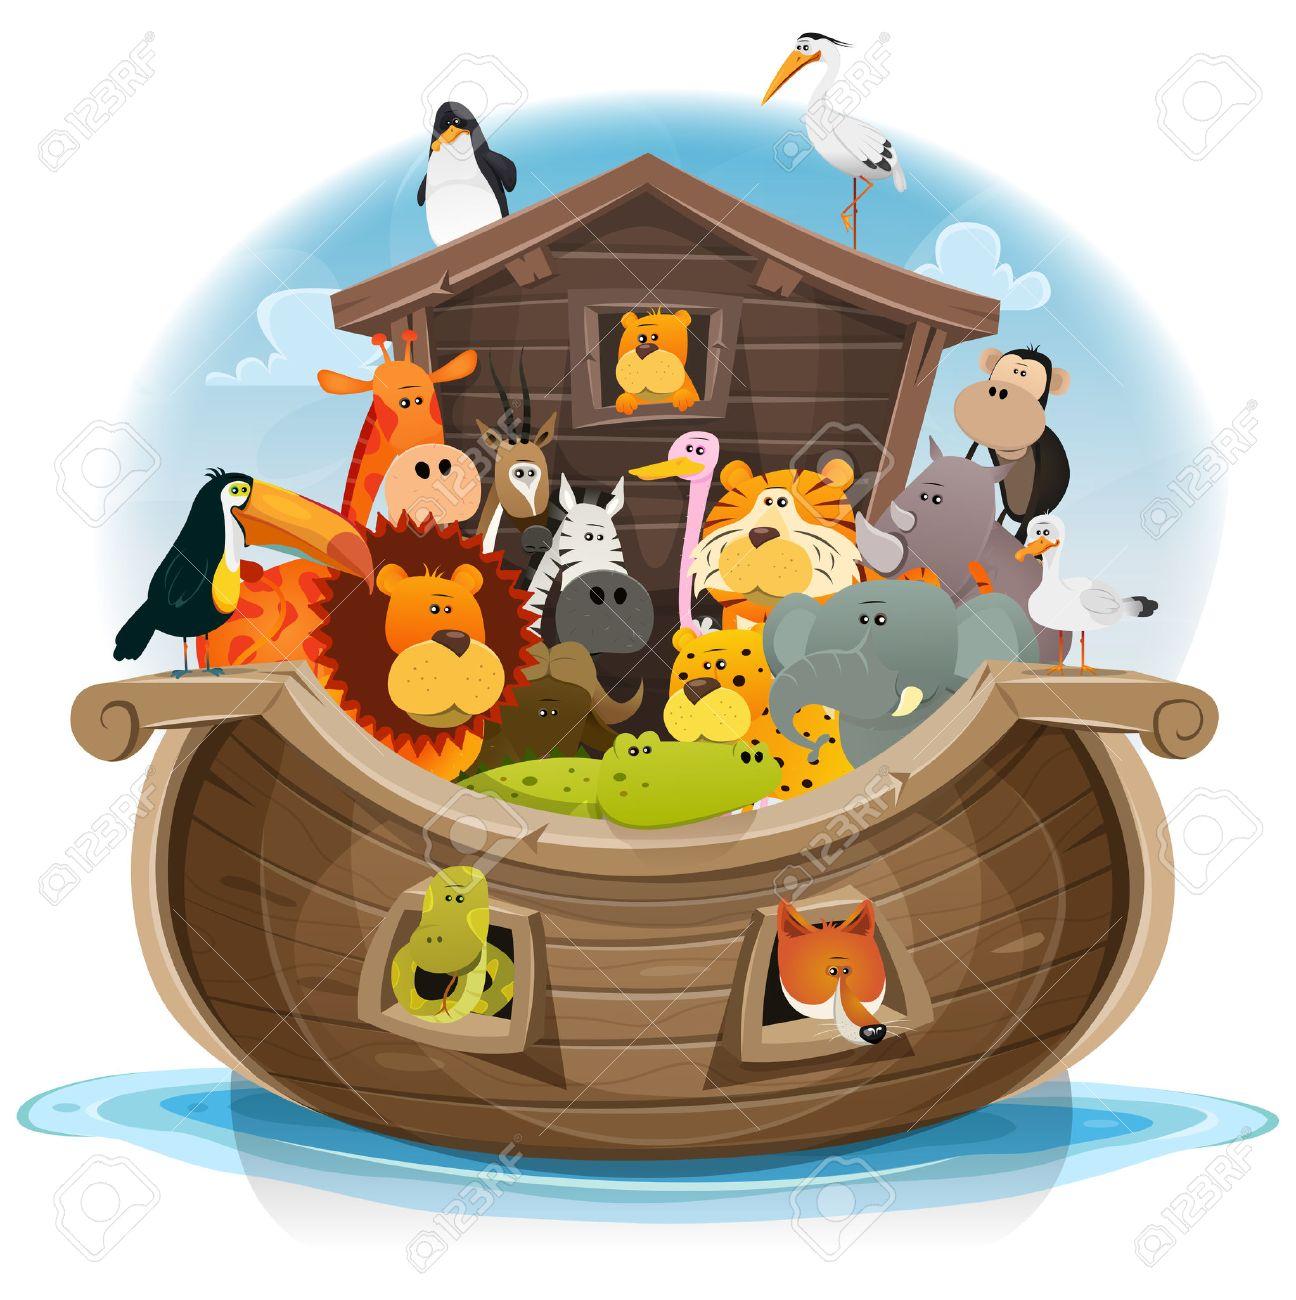 Illustration of cute cartoon group of wild animals inside noah's ark, with lion, elephant, giraffe, gazelle, gorilla monkey, ape, zebra, birds and others on ocean background - 52960527